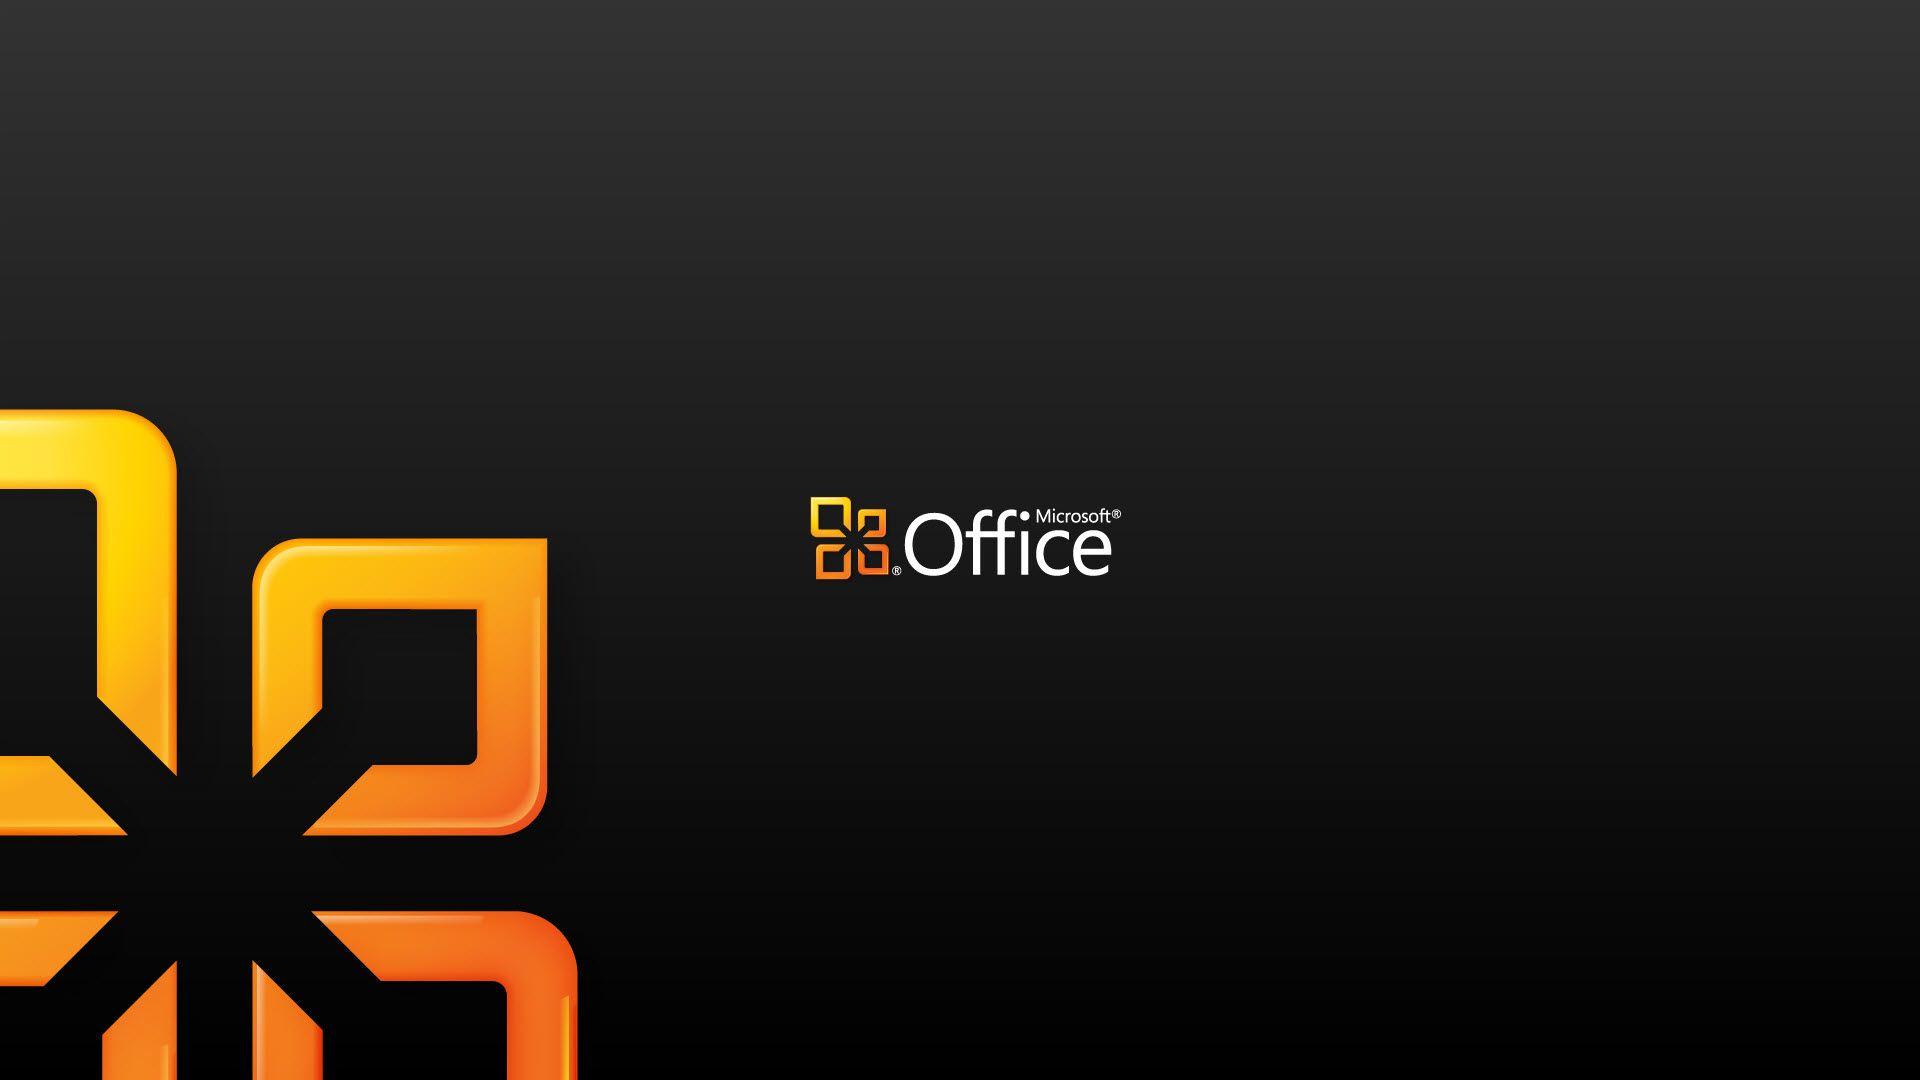 1600x1600px #849088 Microsoft Office 2010 (145.8 KB) | 25.06.2015 ...